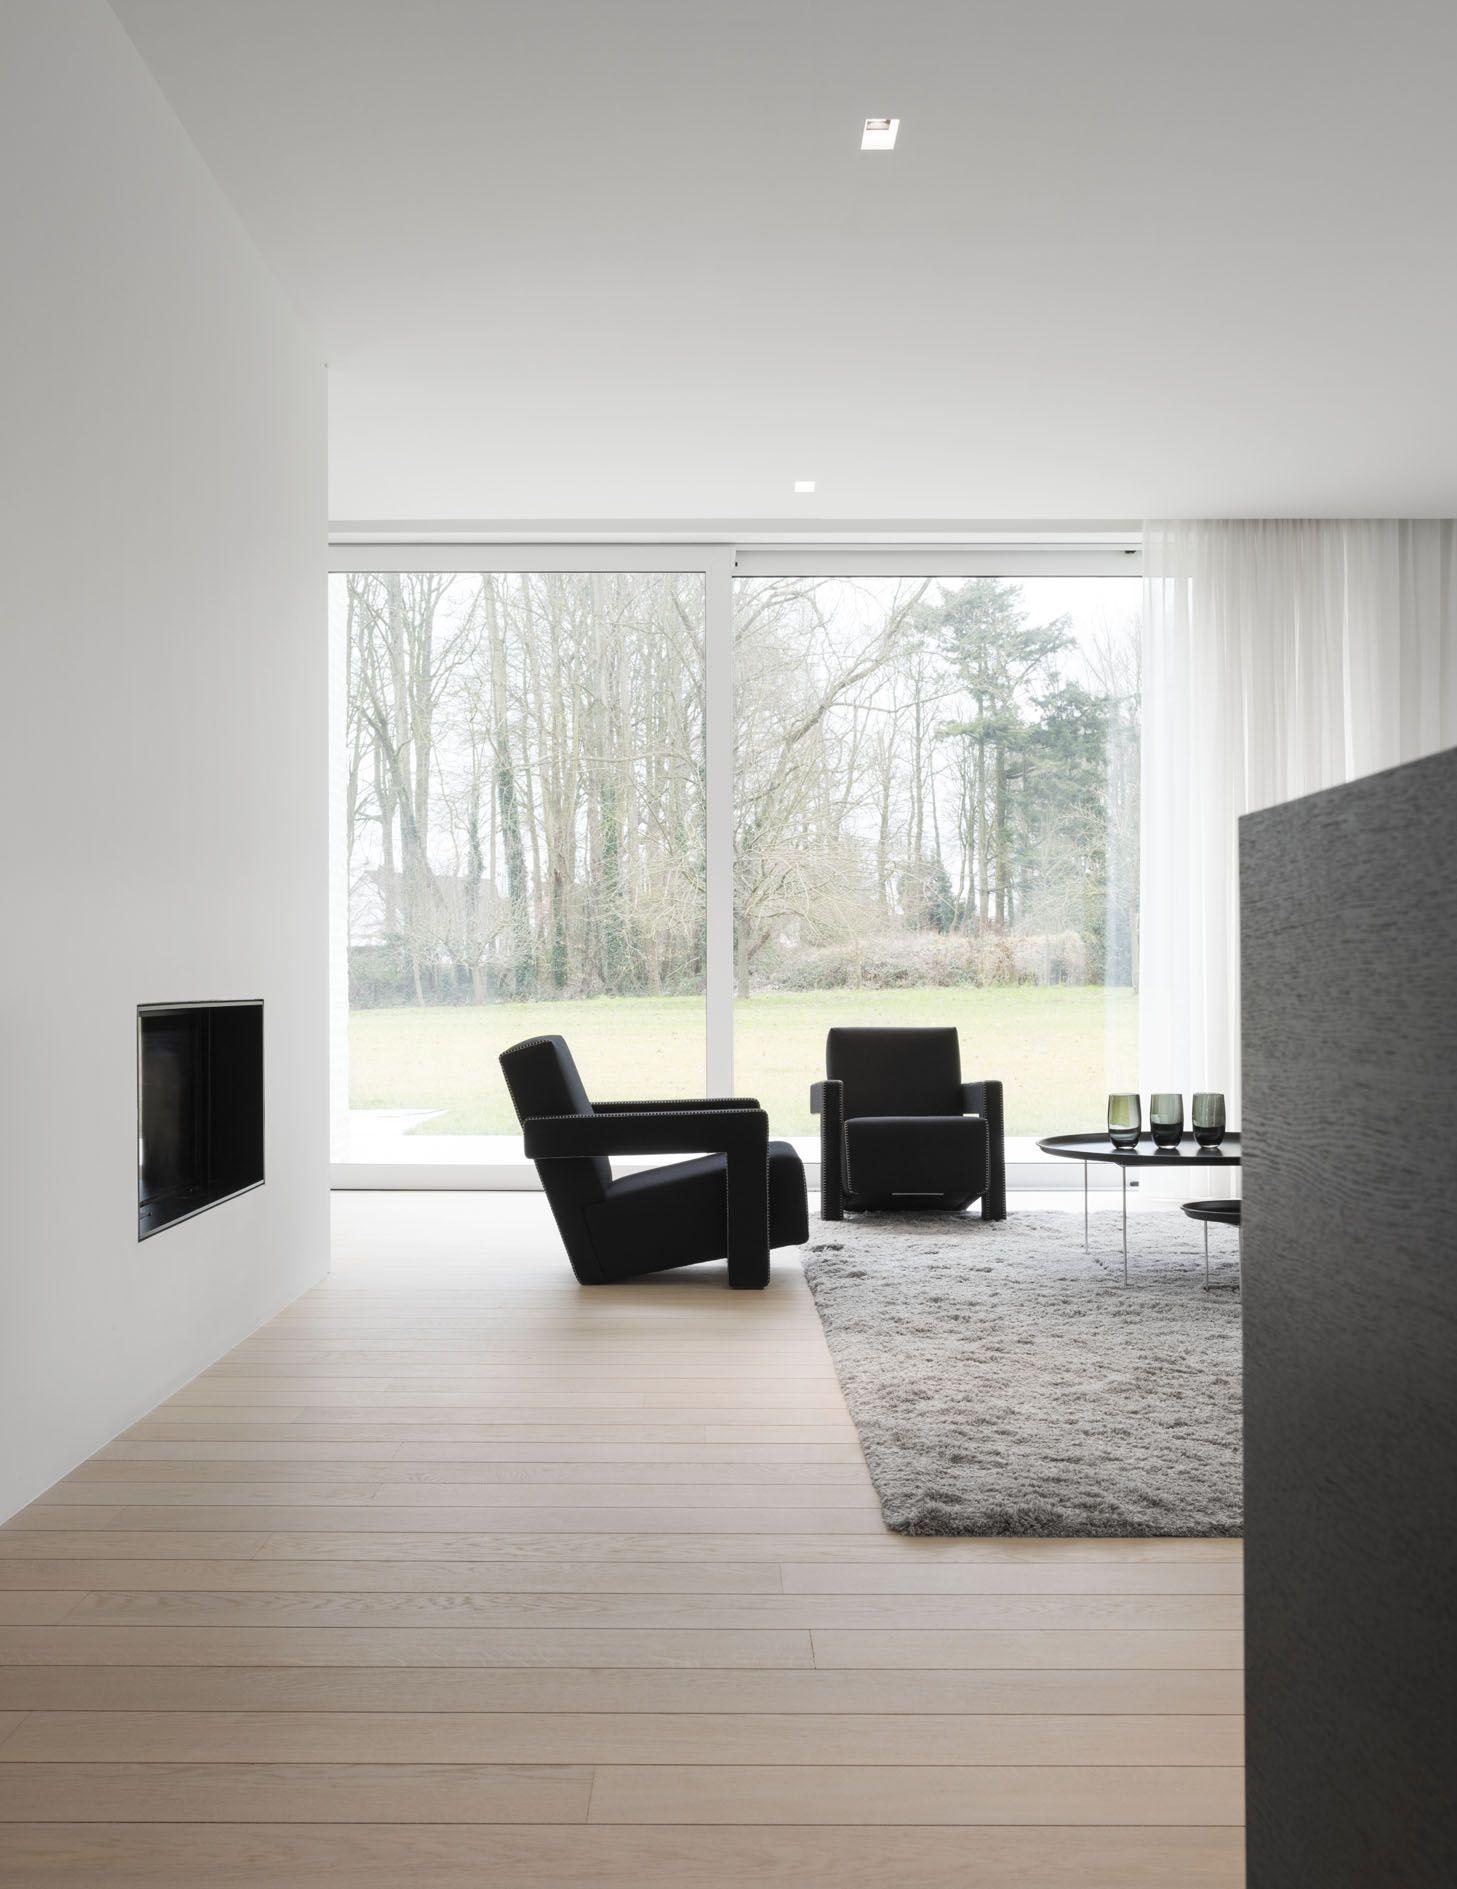 Big Windows Wall Accompanying Minimal Living Room Decor Min